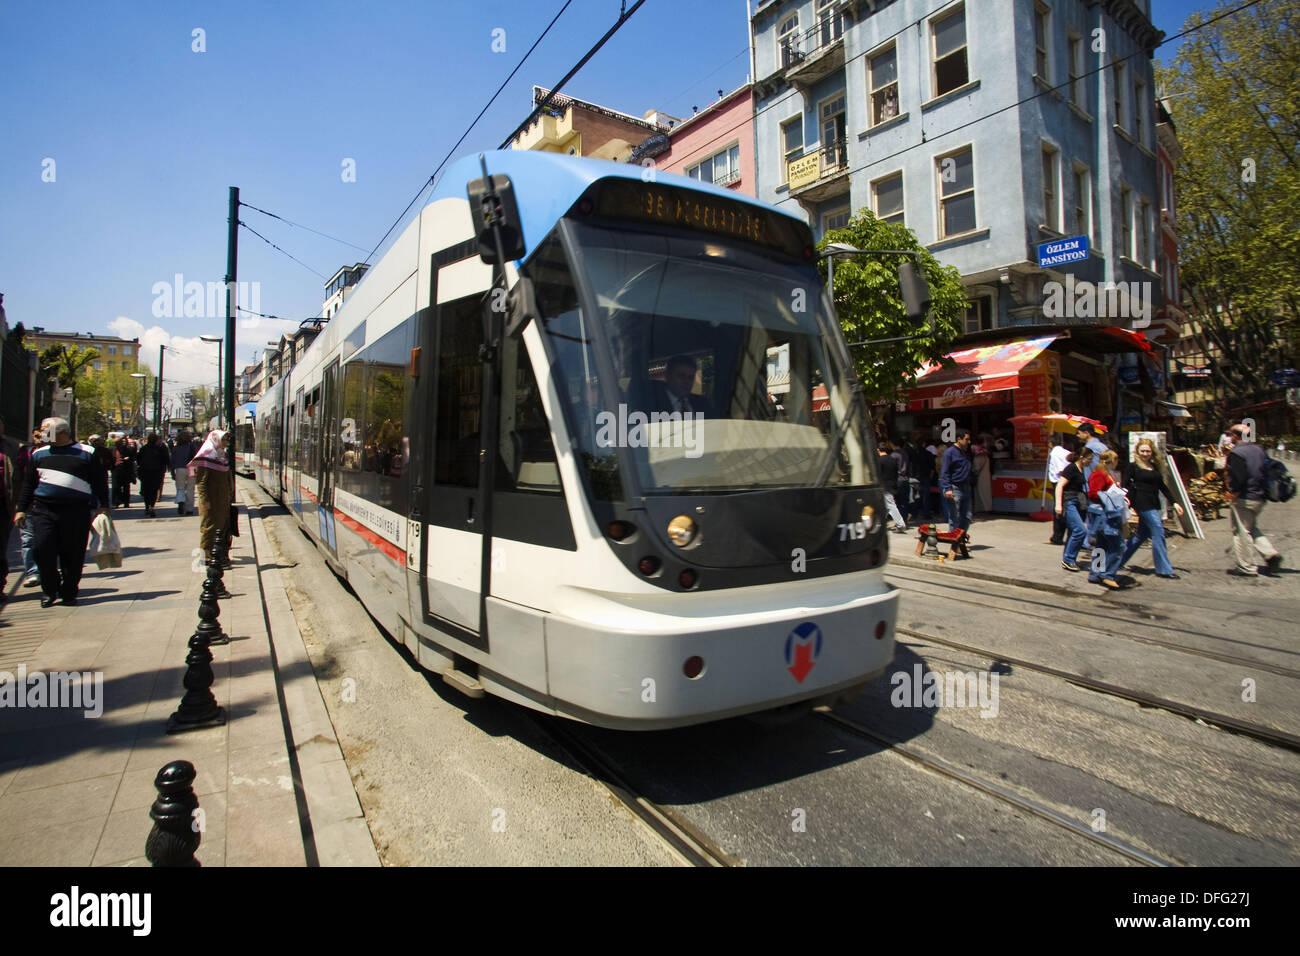 Tram in Sultanahmet, Istanbul, Turkey - Stock Image